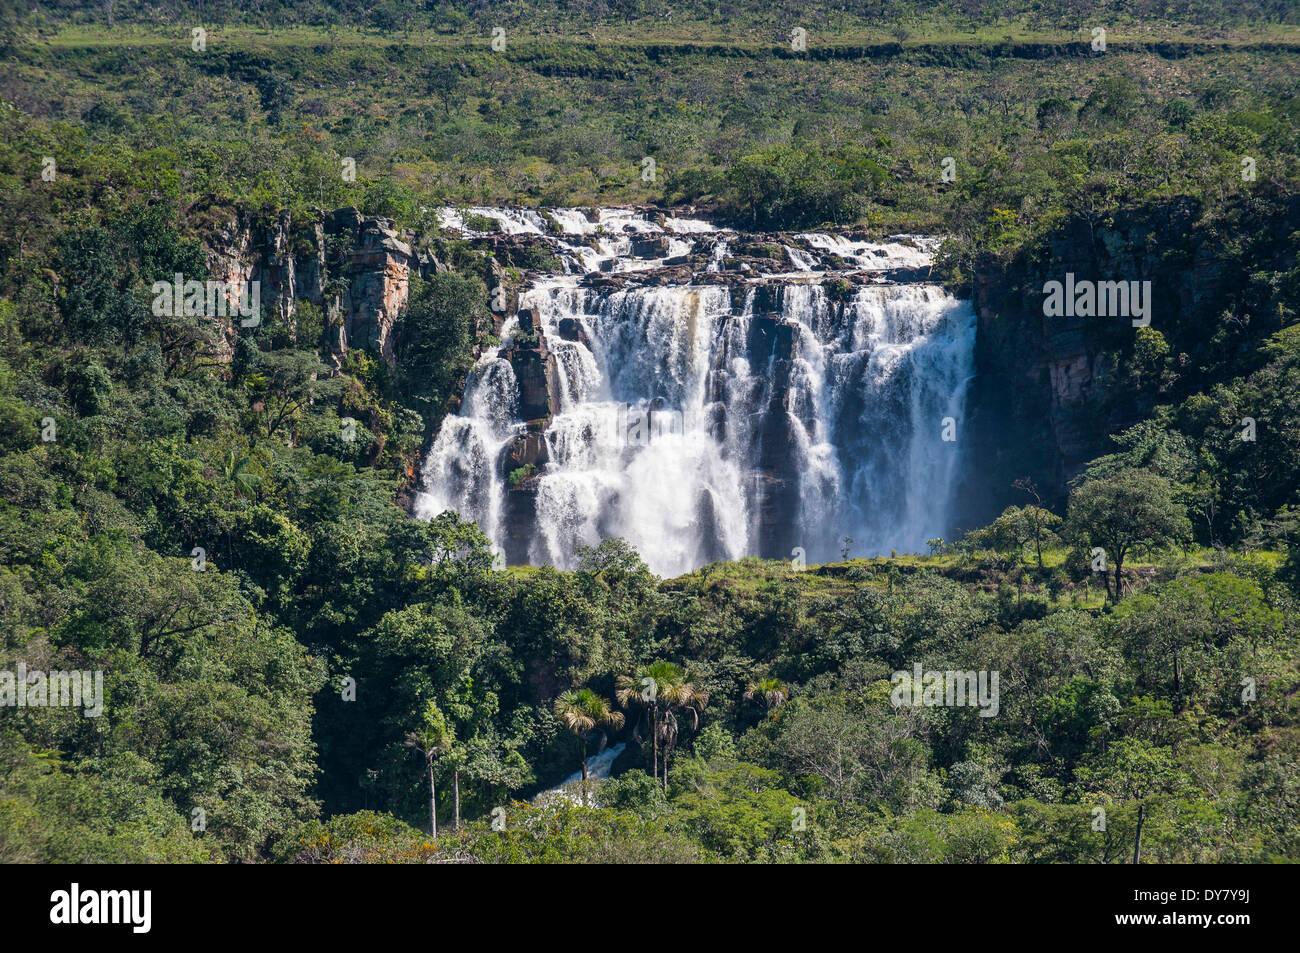 Corumba waterfalls, near Pirenópolis, Goiás, Brazil - Stock Image